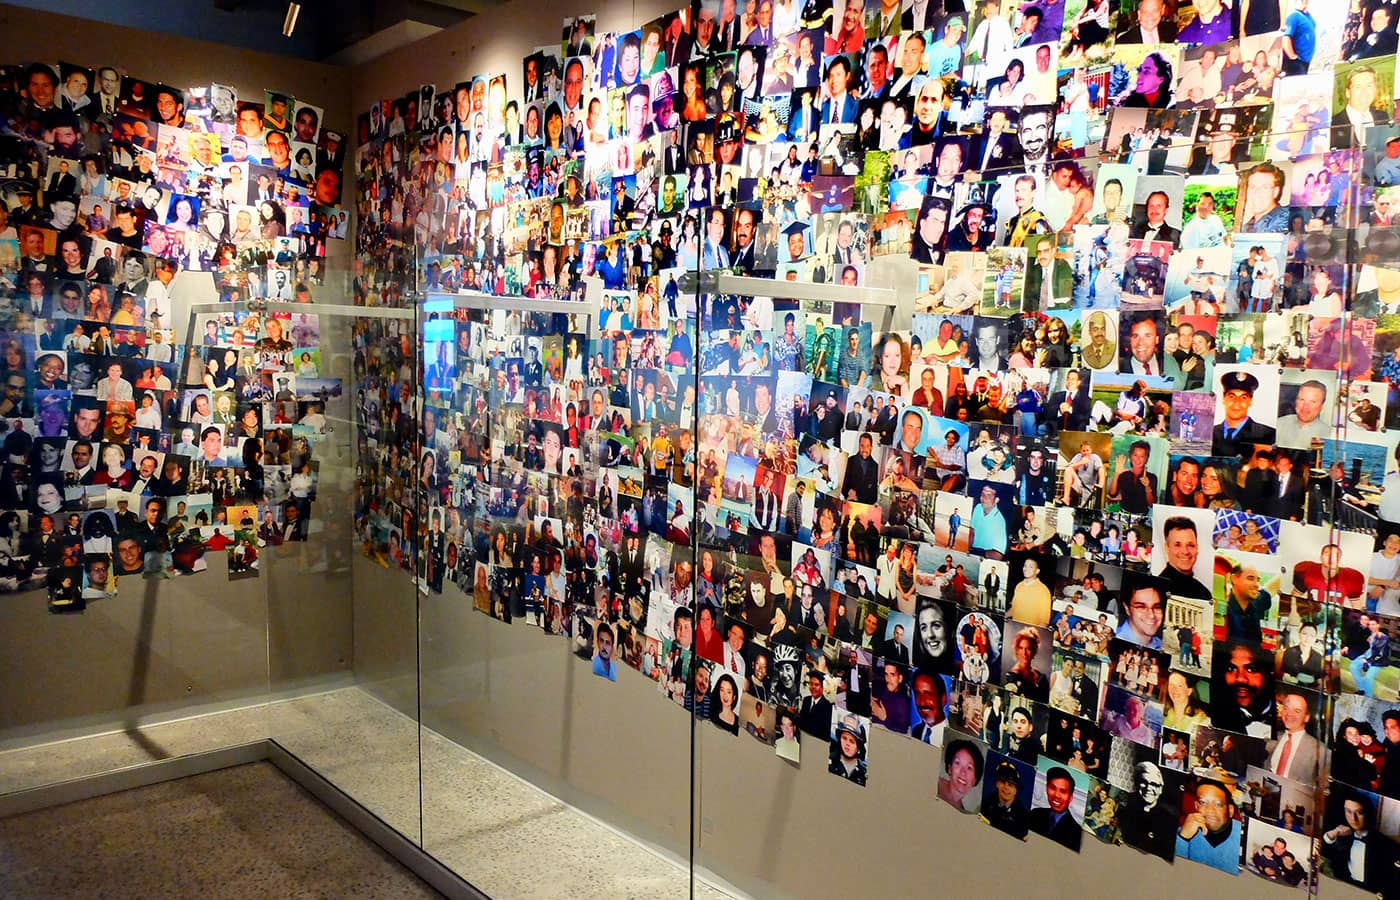 911 Tribute Museum in New York - Fotomuur